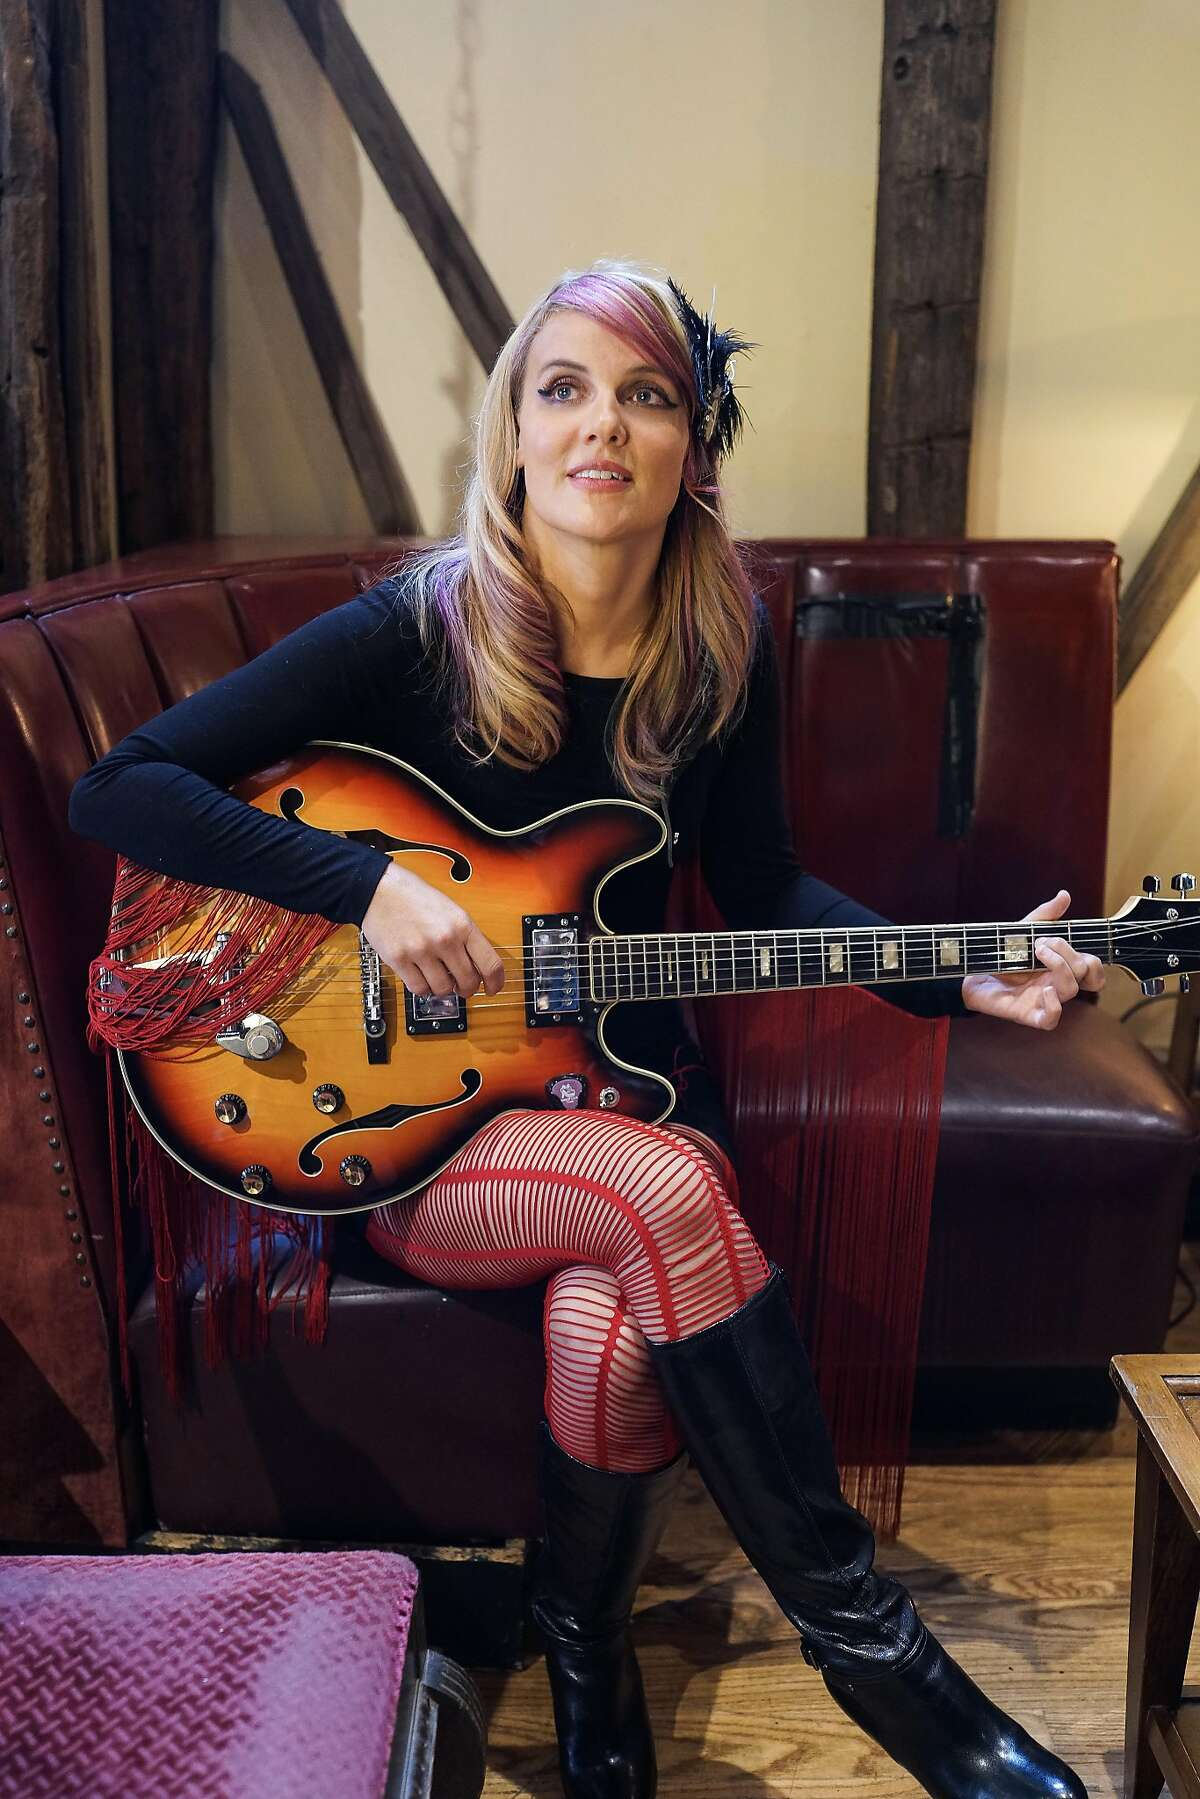 MISCELLANEOUS WOMEN MUSICIANS FOR SAN FRANCISCO CHRONICLE 2017